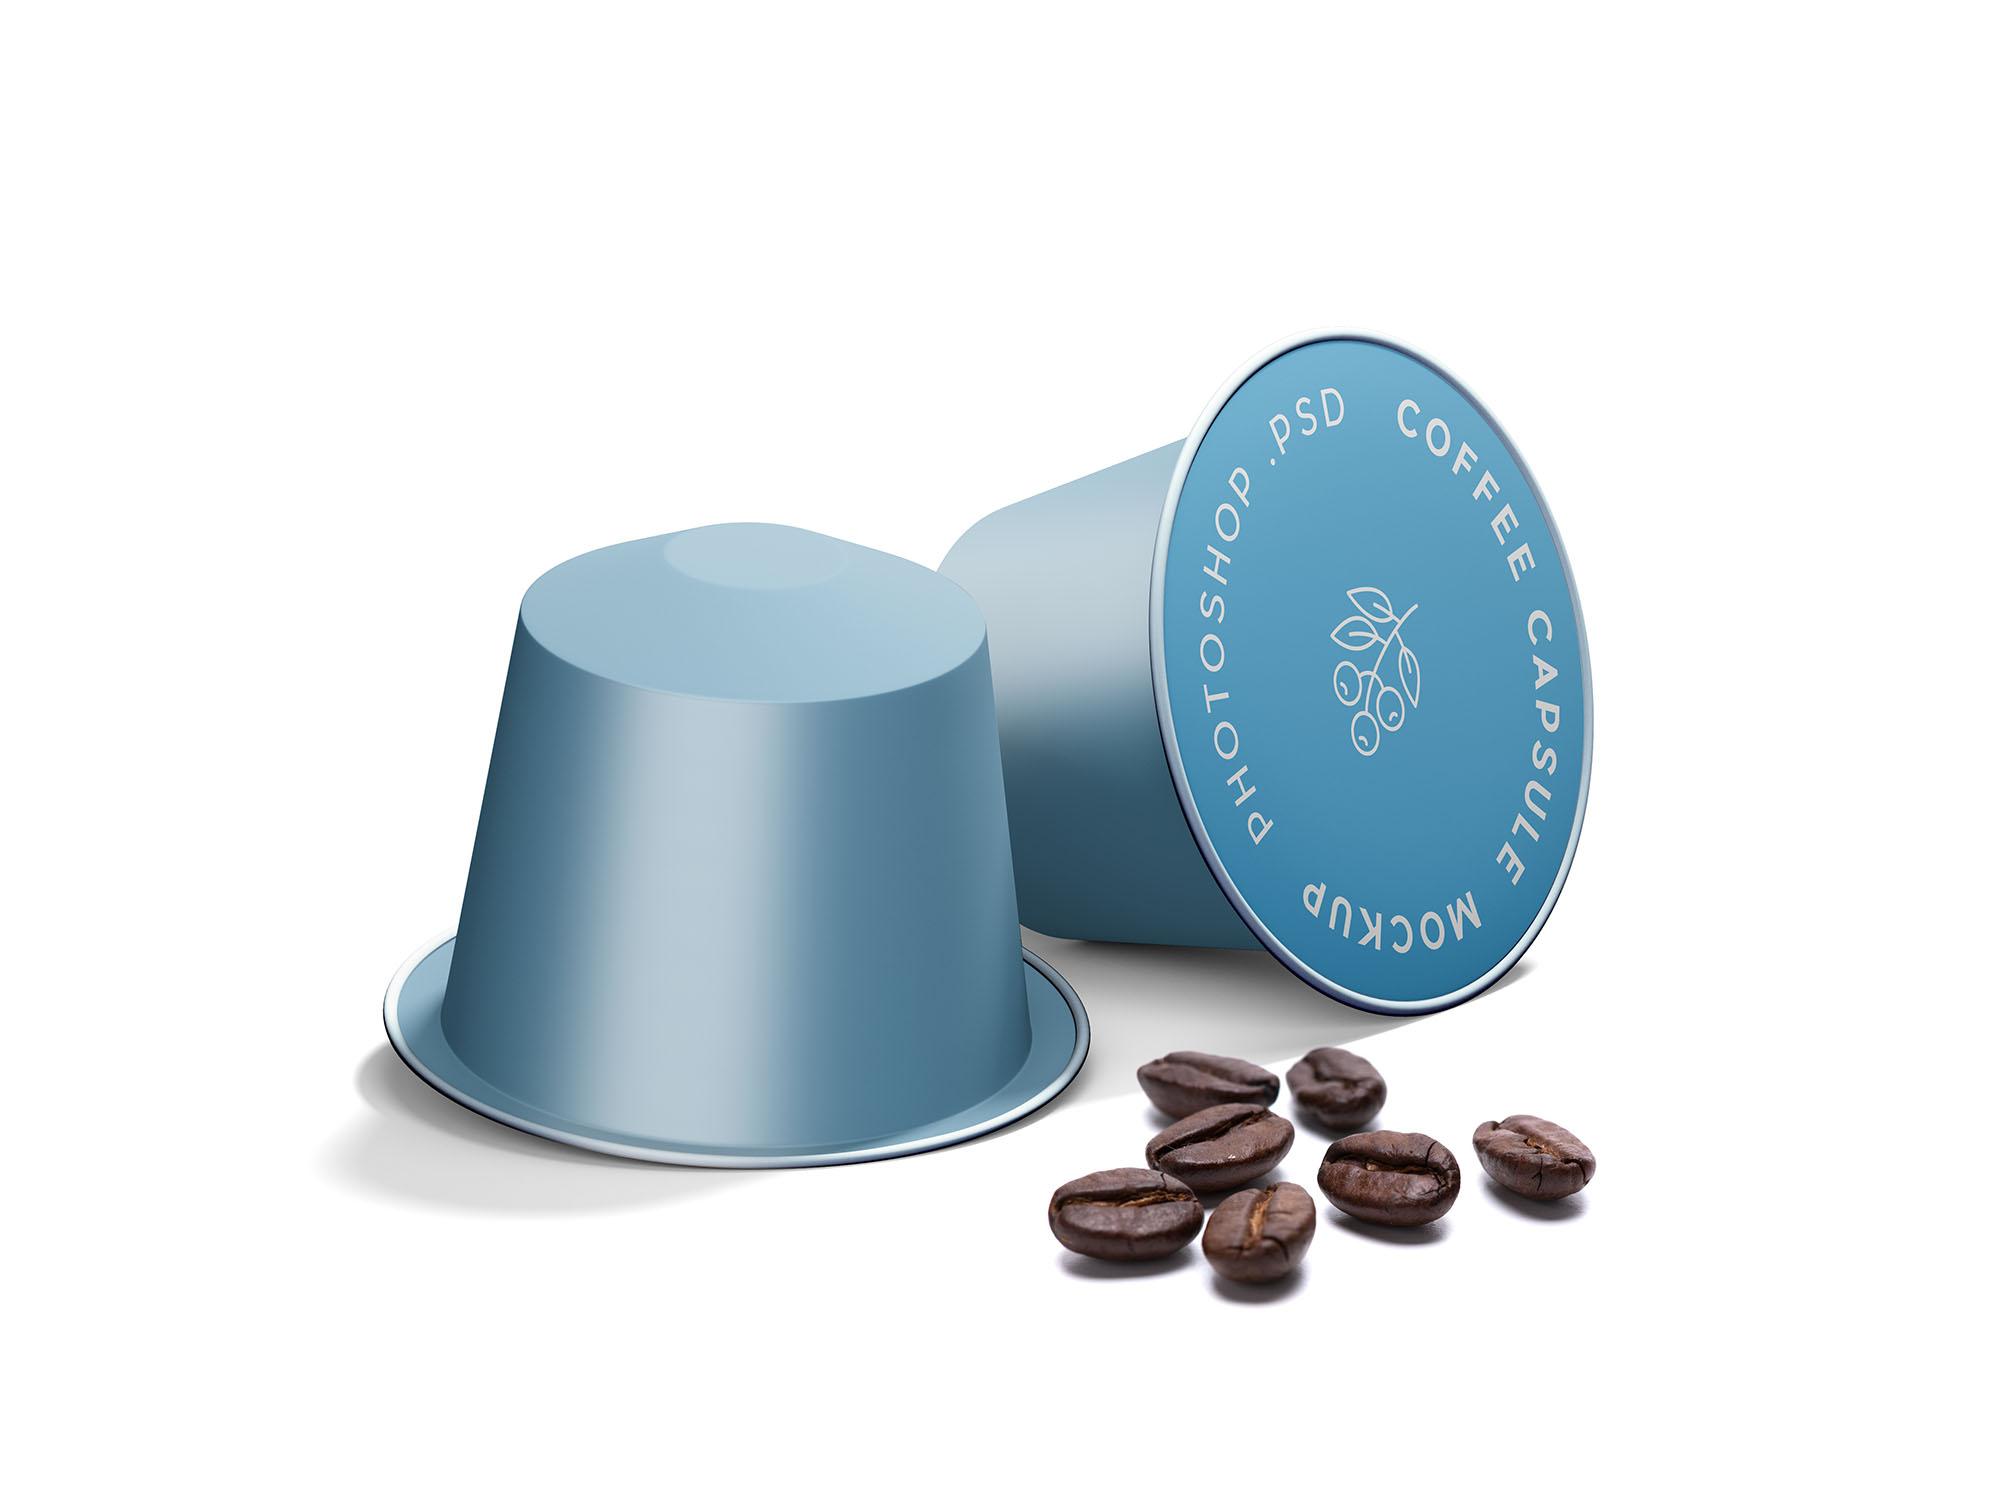 Coffee Capsule Mockup